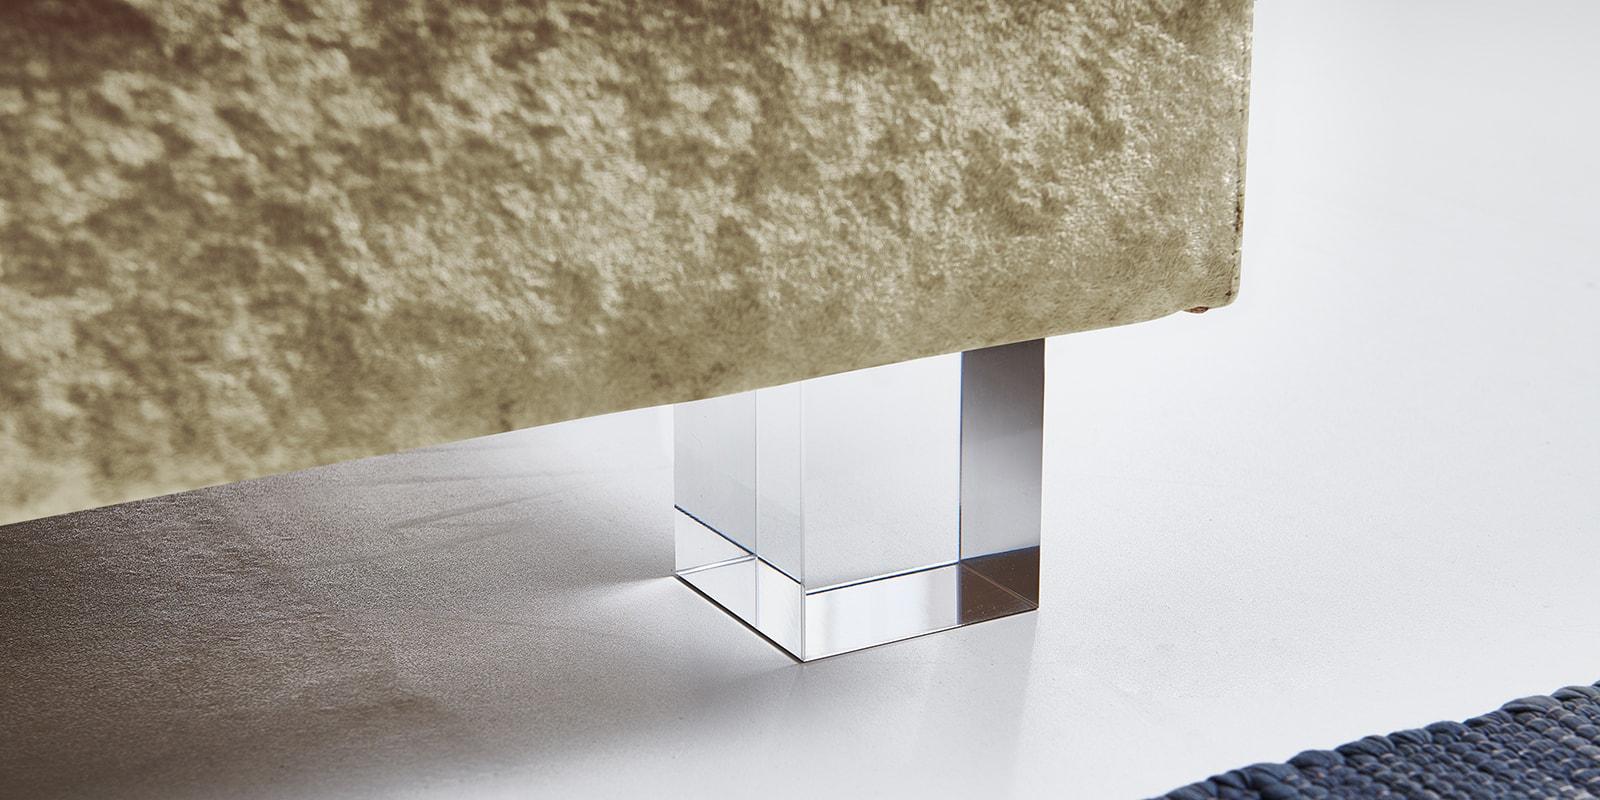 Moebella24 - Boxspringbett - Gold - Samt - Acryl Füße eckig - Glas Optik